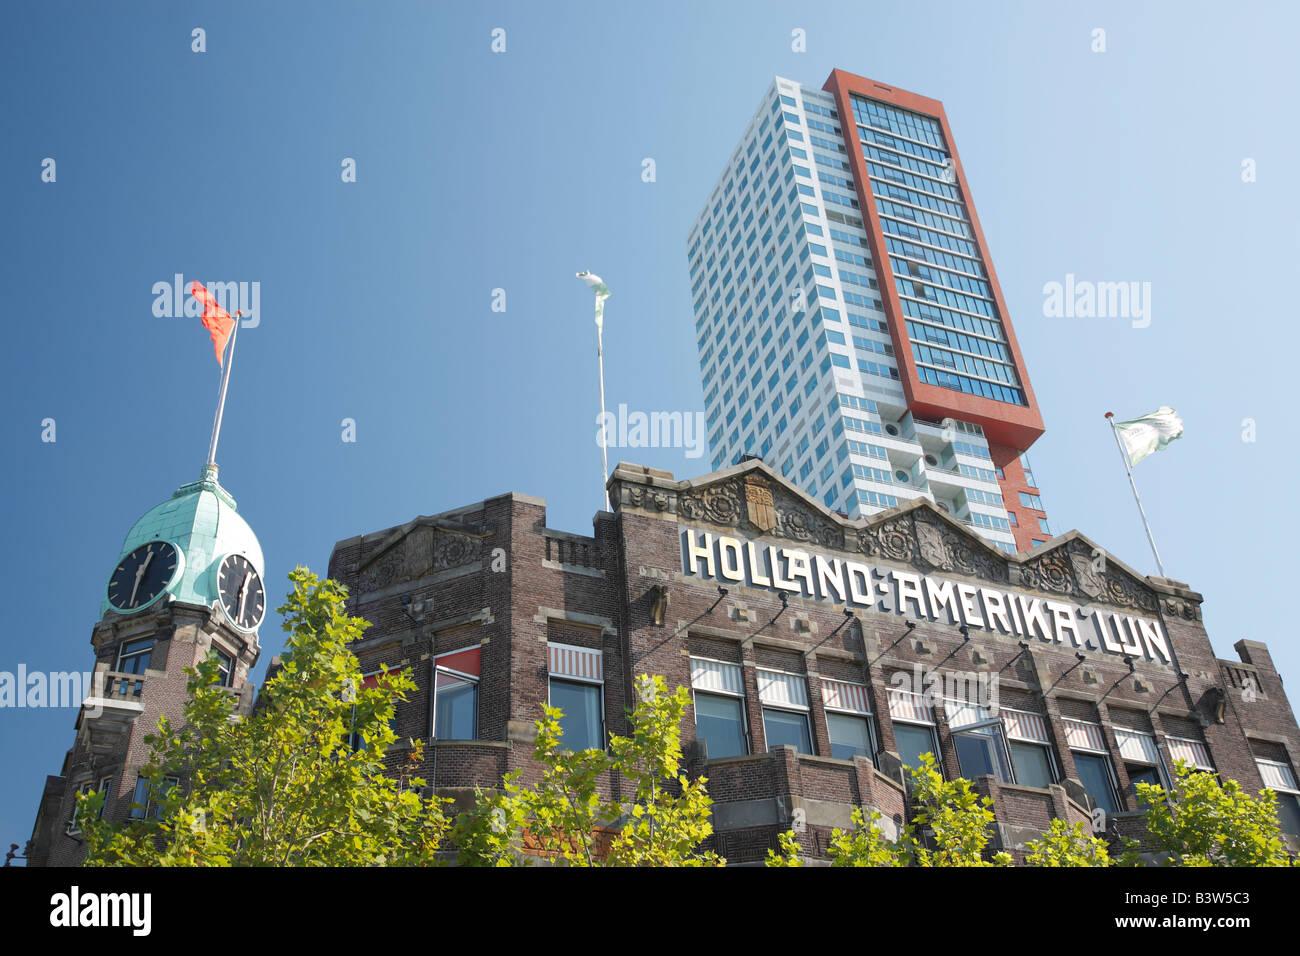 Hotel New York, Holland Amerika Lun Building, Rotterdam Netherlands